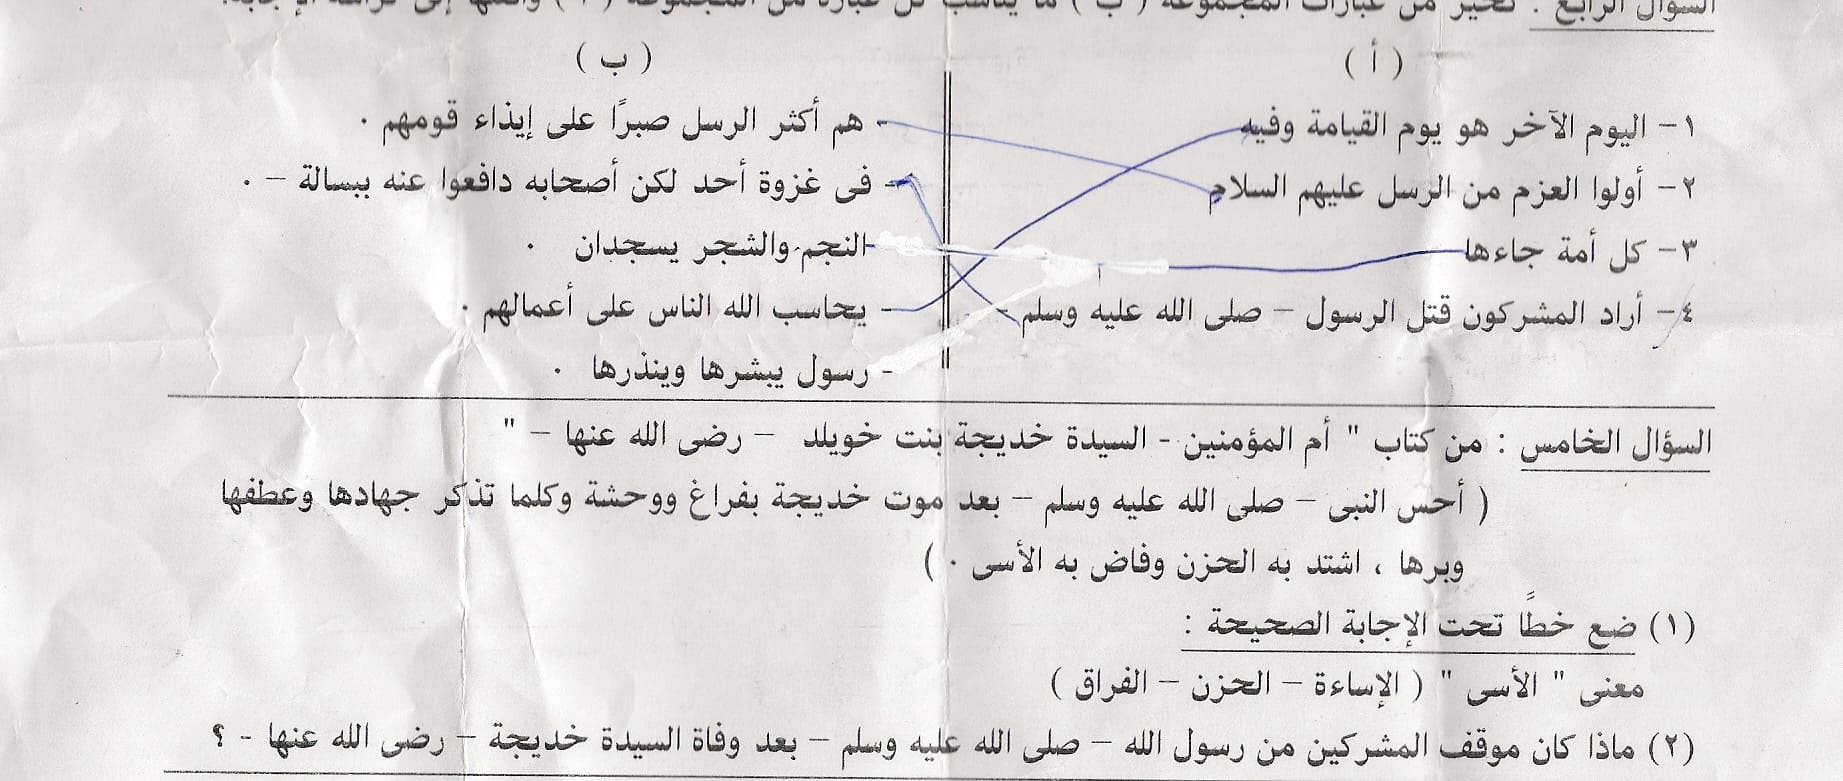 exam-eg.com_13496905892.jpg